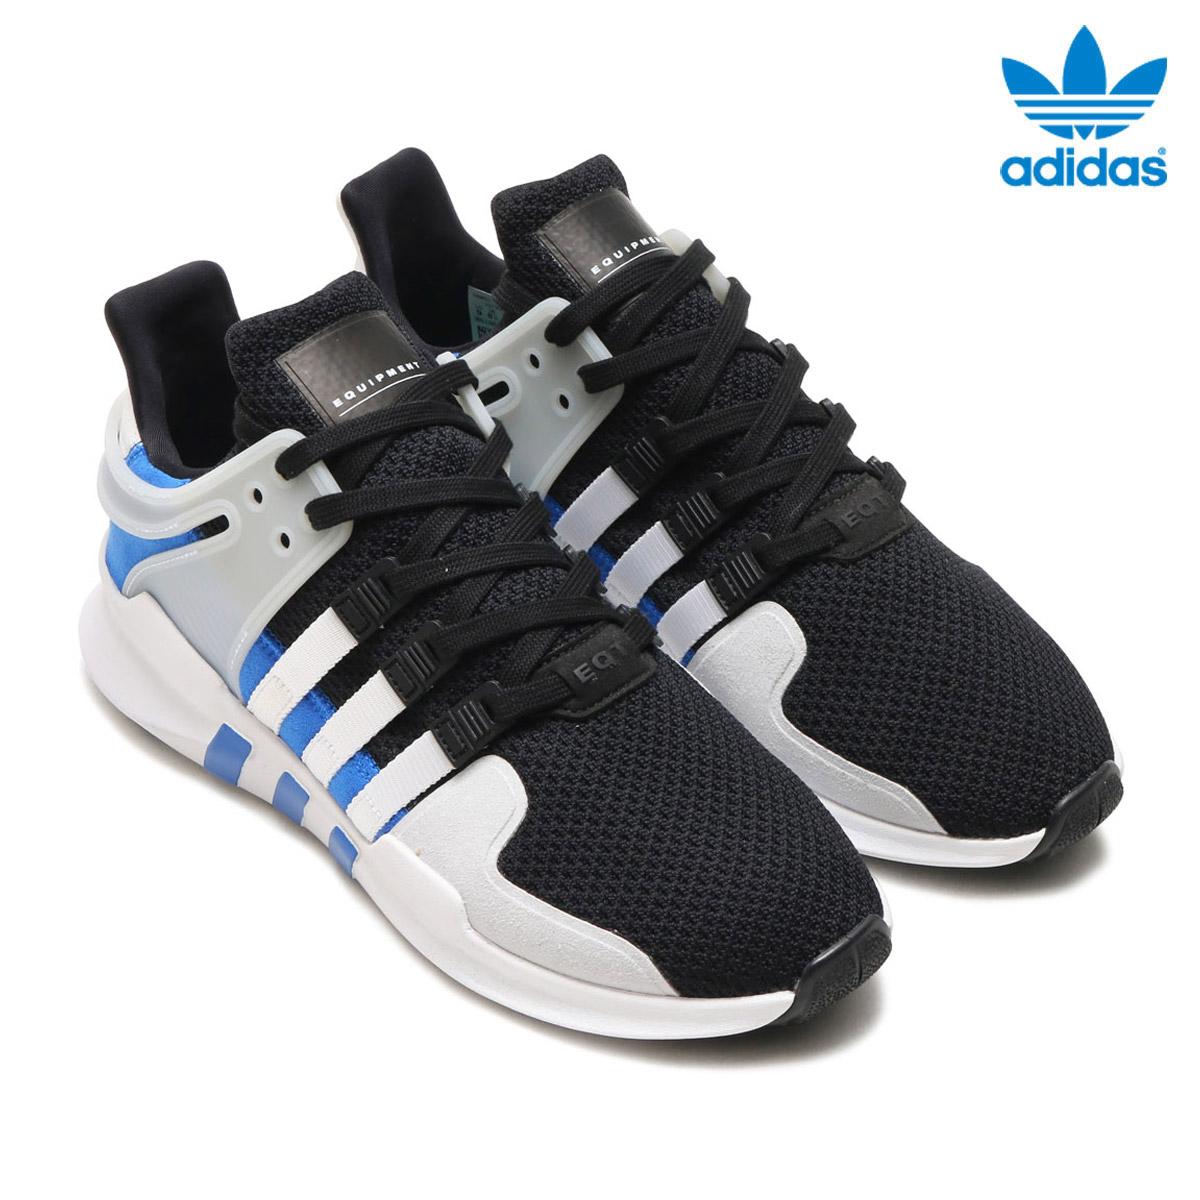 adidas Originals EQT SUPPORTADV(アディダス EQT サポートADV)(ブラック)【メンズ】17FW-S